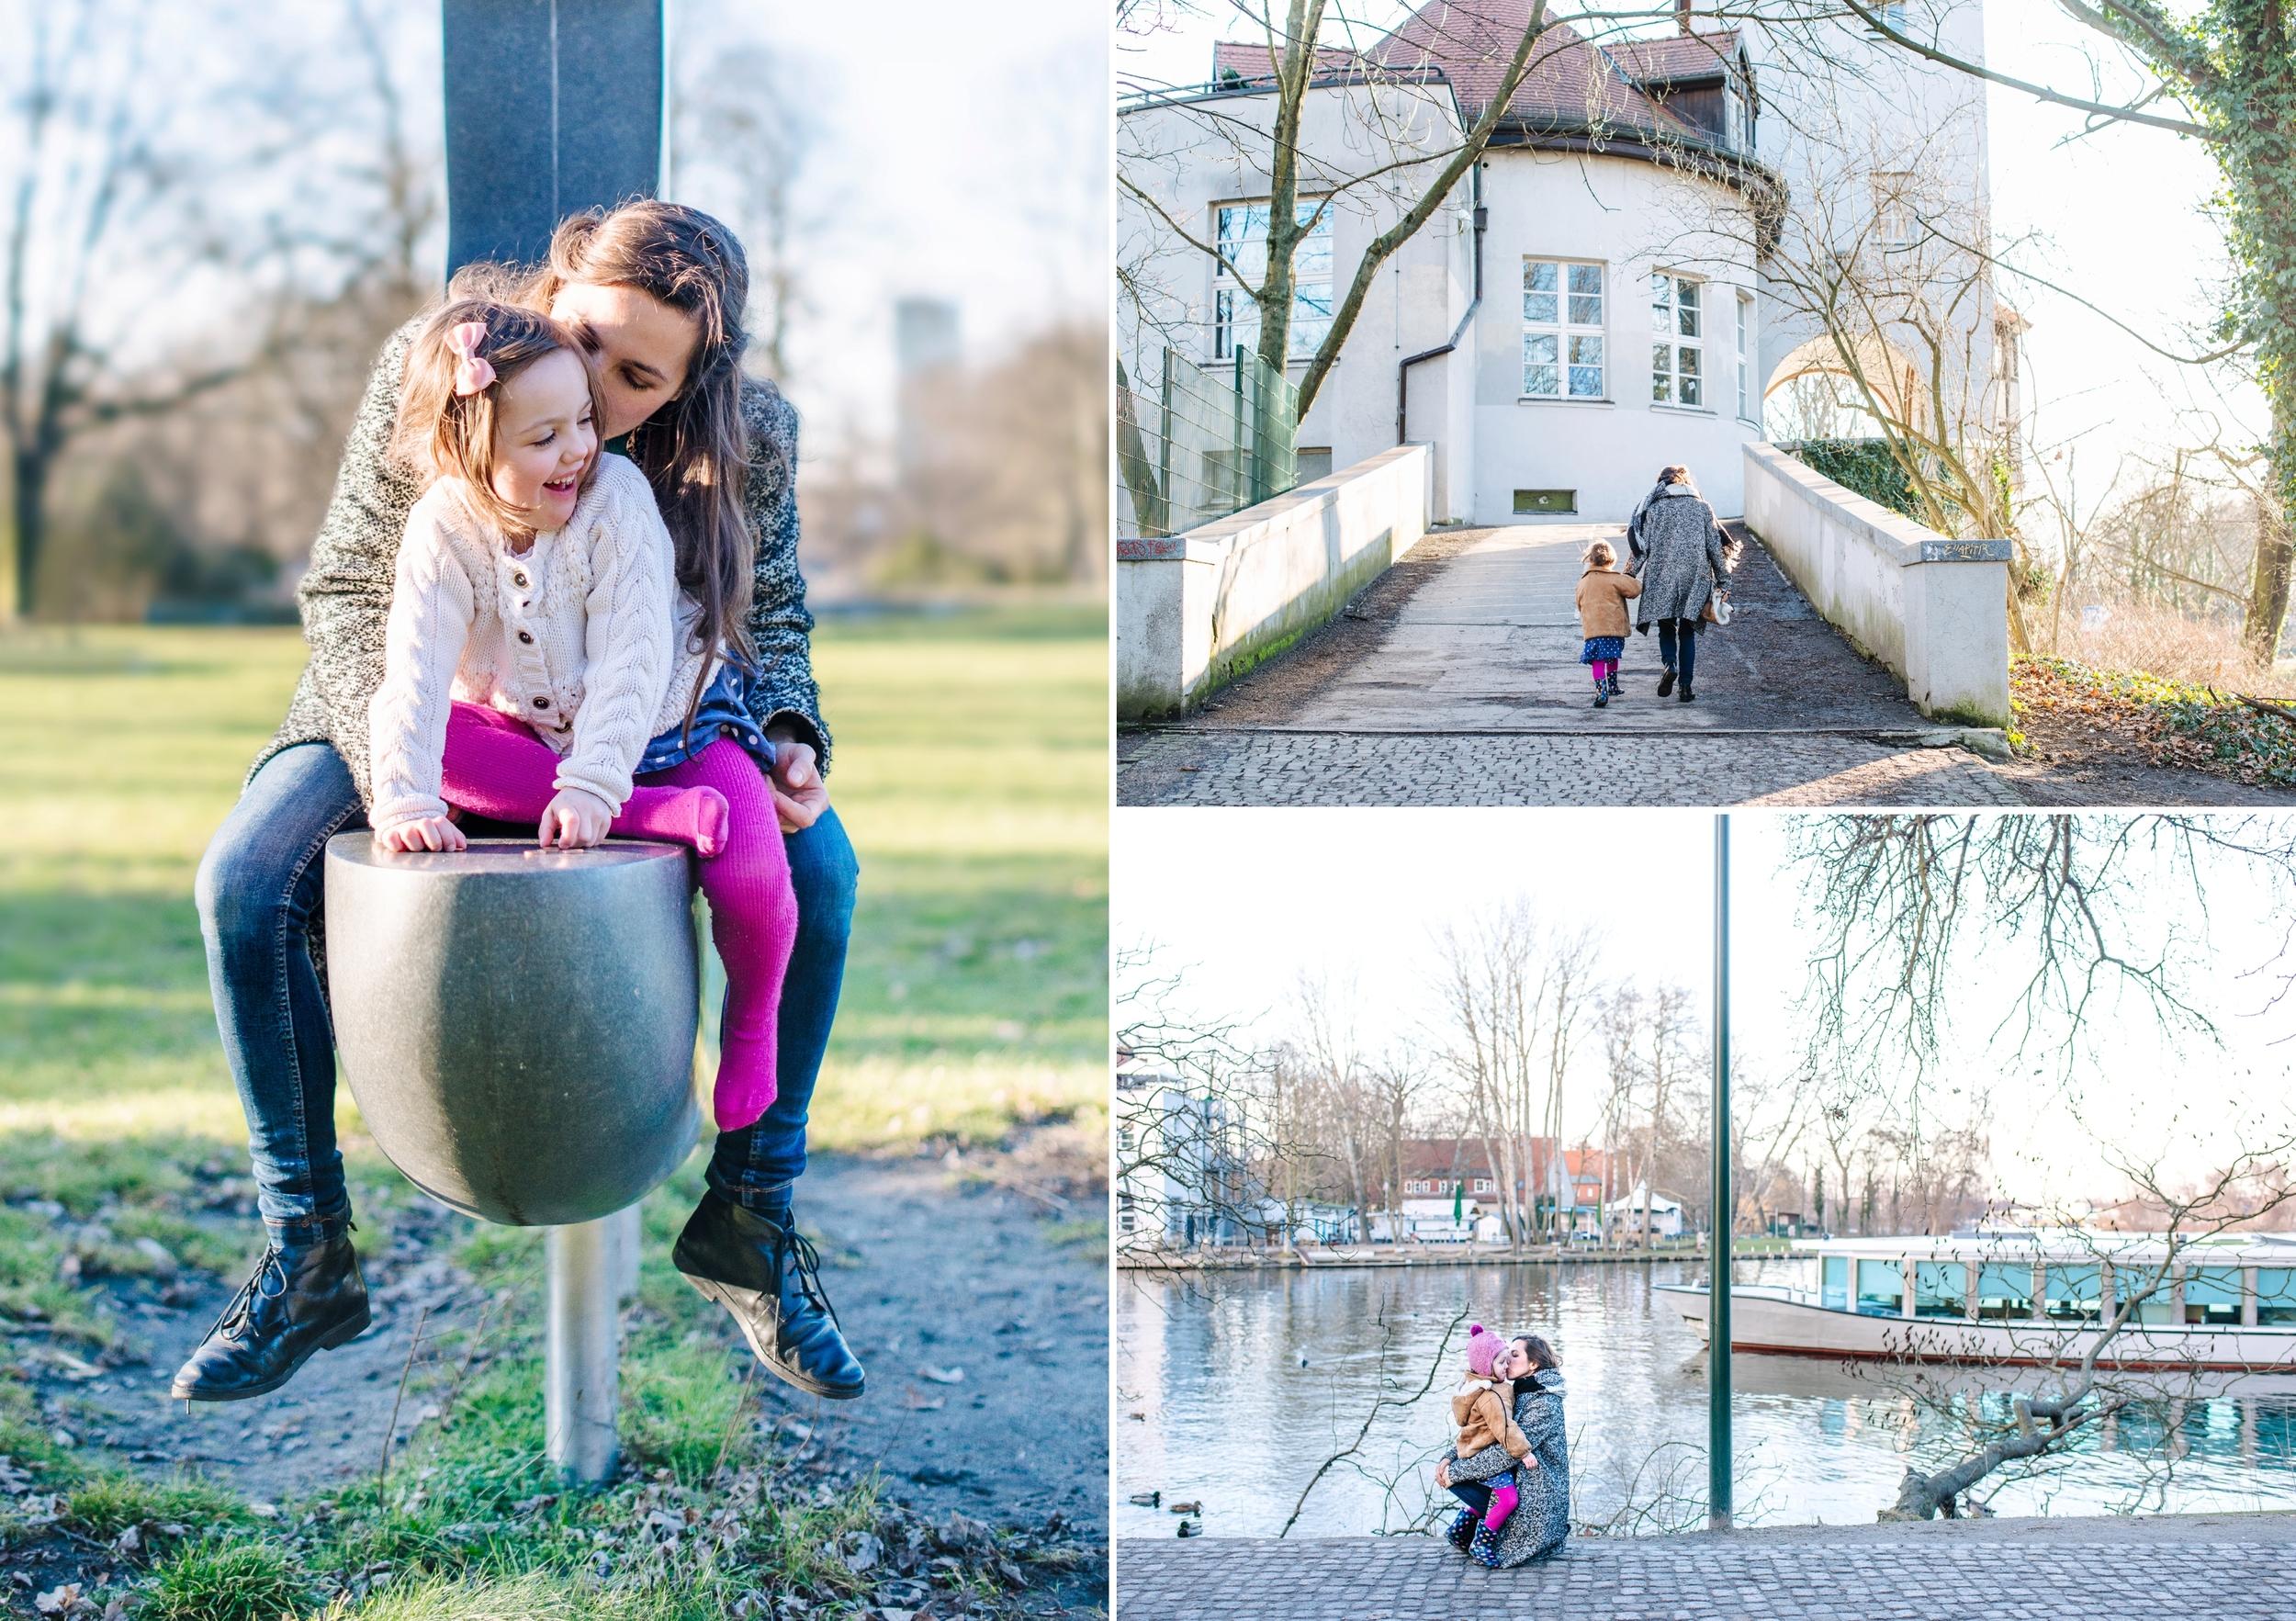 fotolocation-berlin